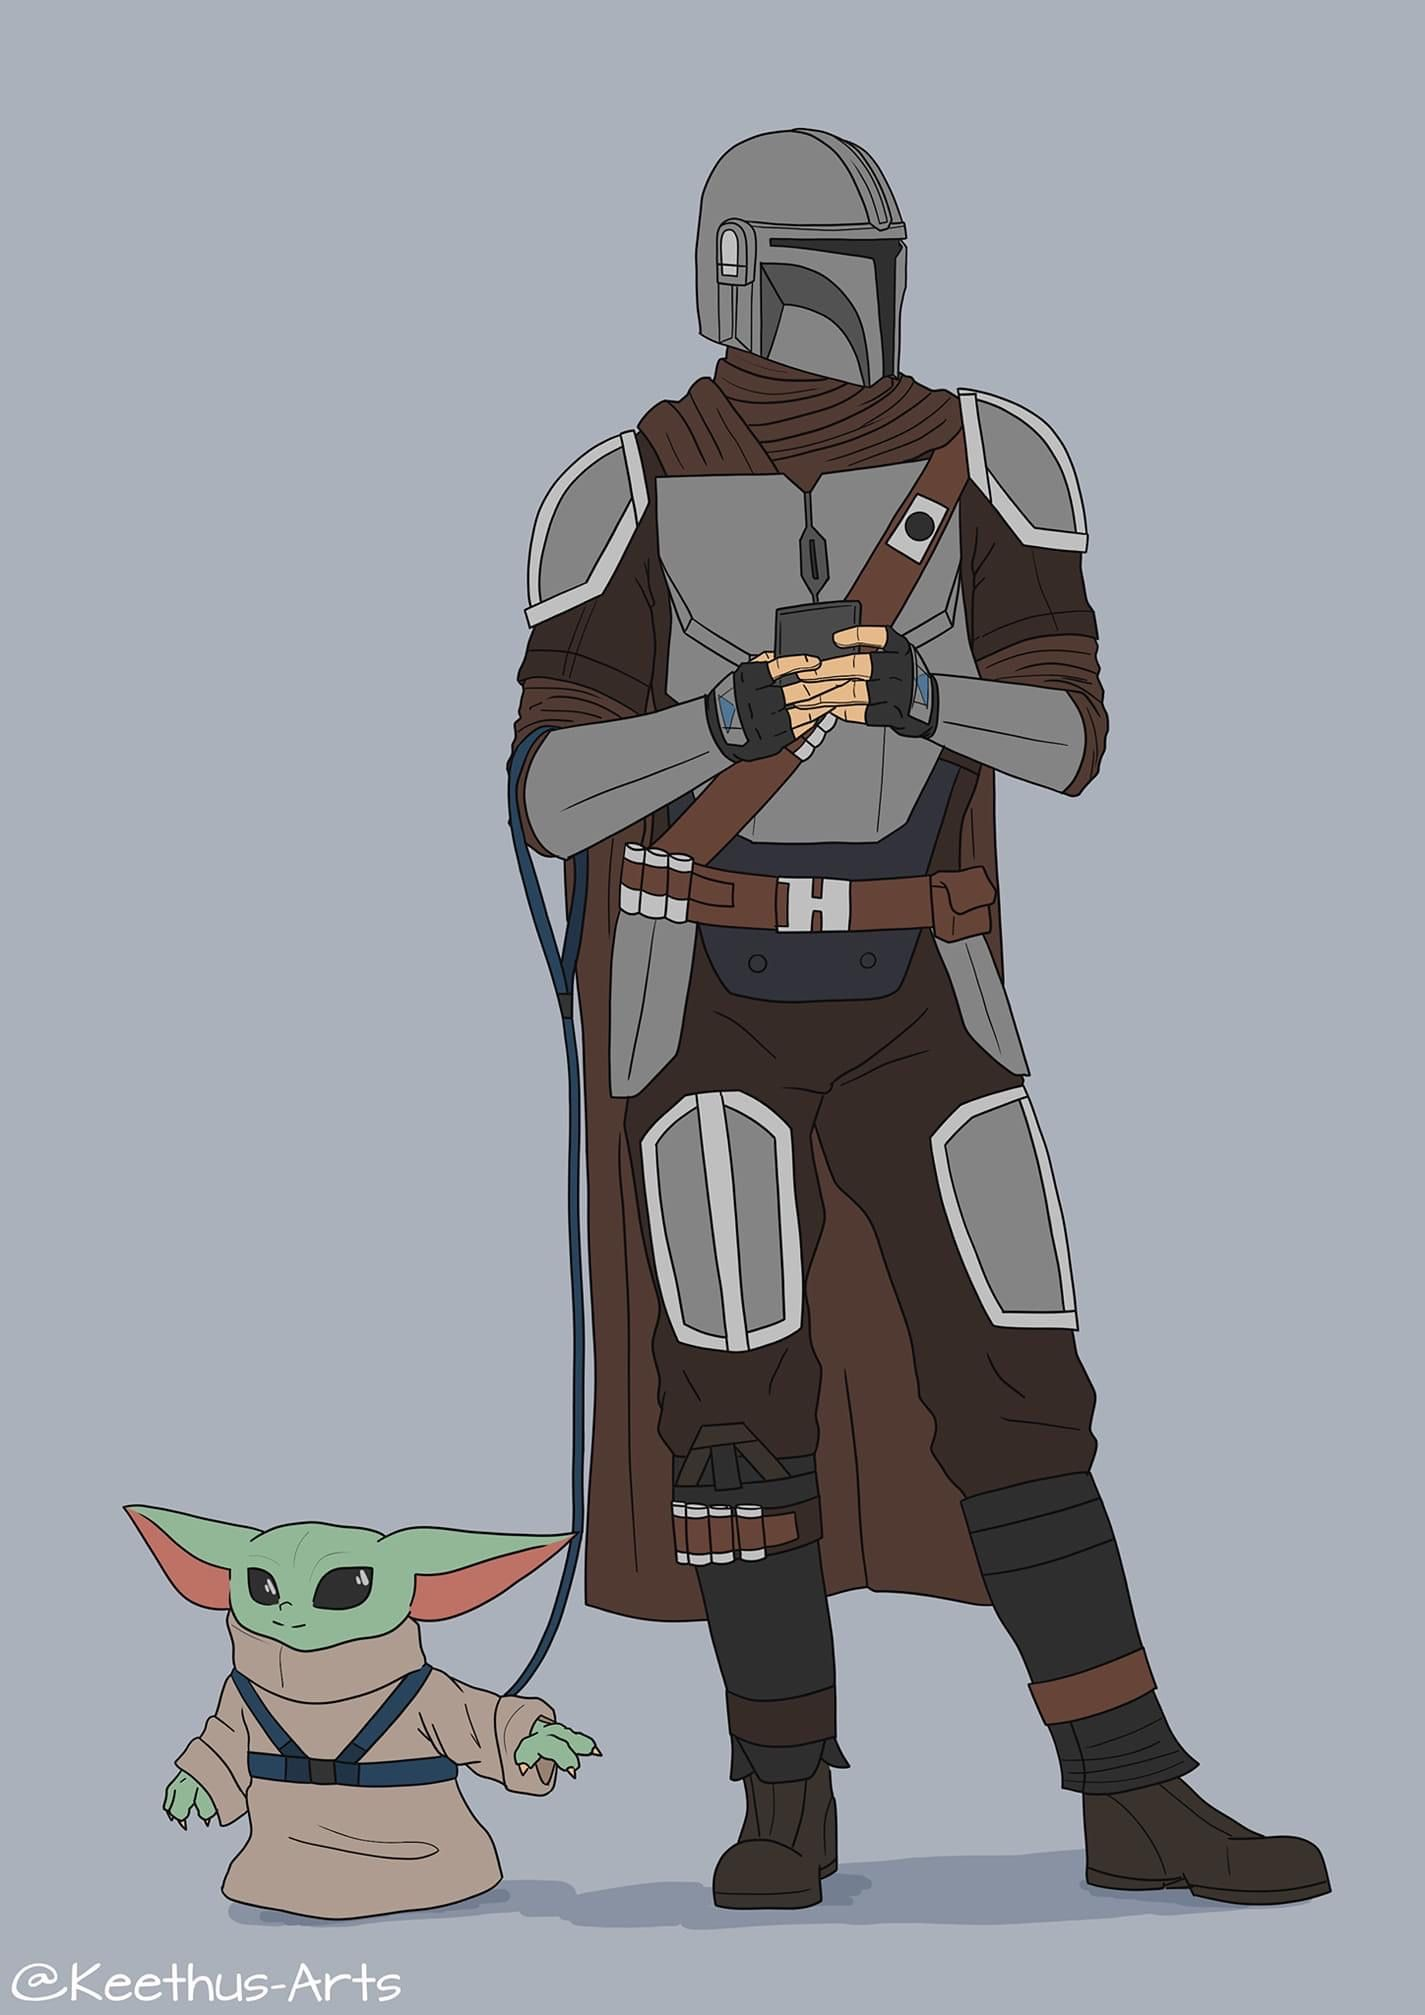 Pin By Alexis On Baby Yoda Shrine In 2020 Star Wars Humor Star Wars Artwork Star Wars Nerd